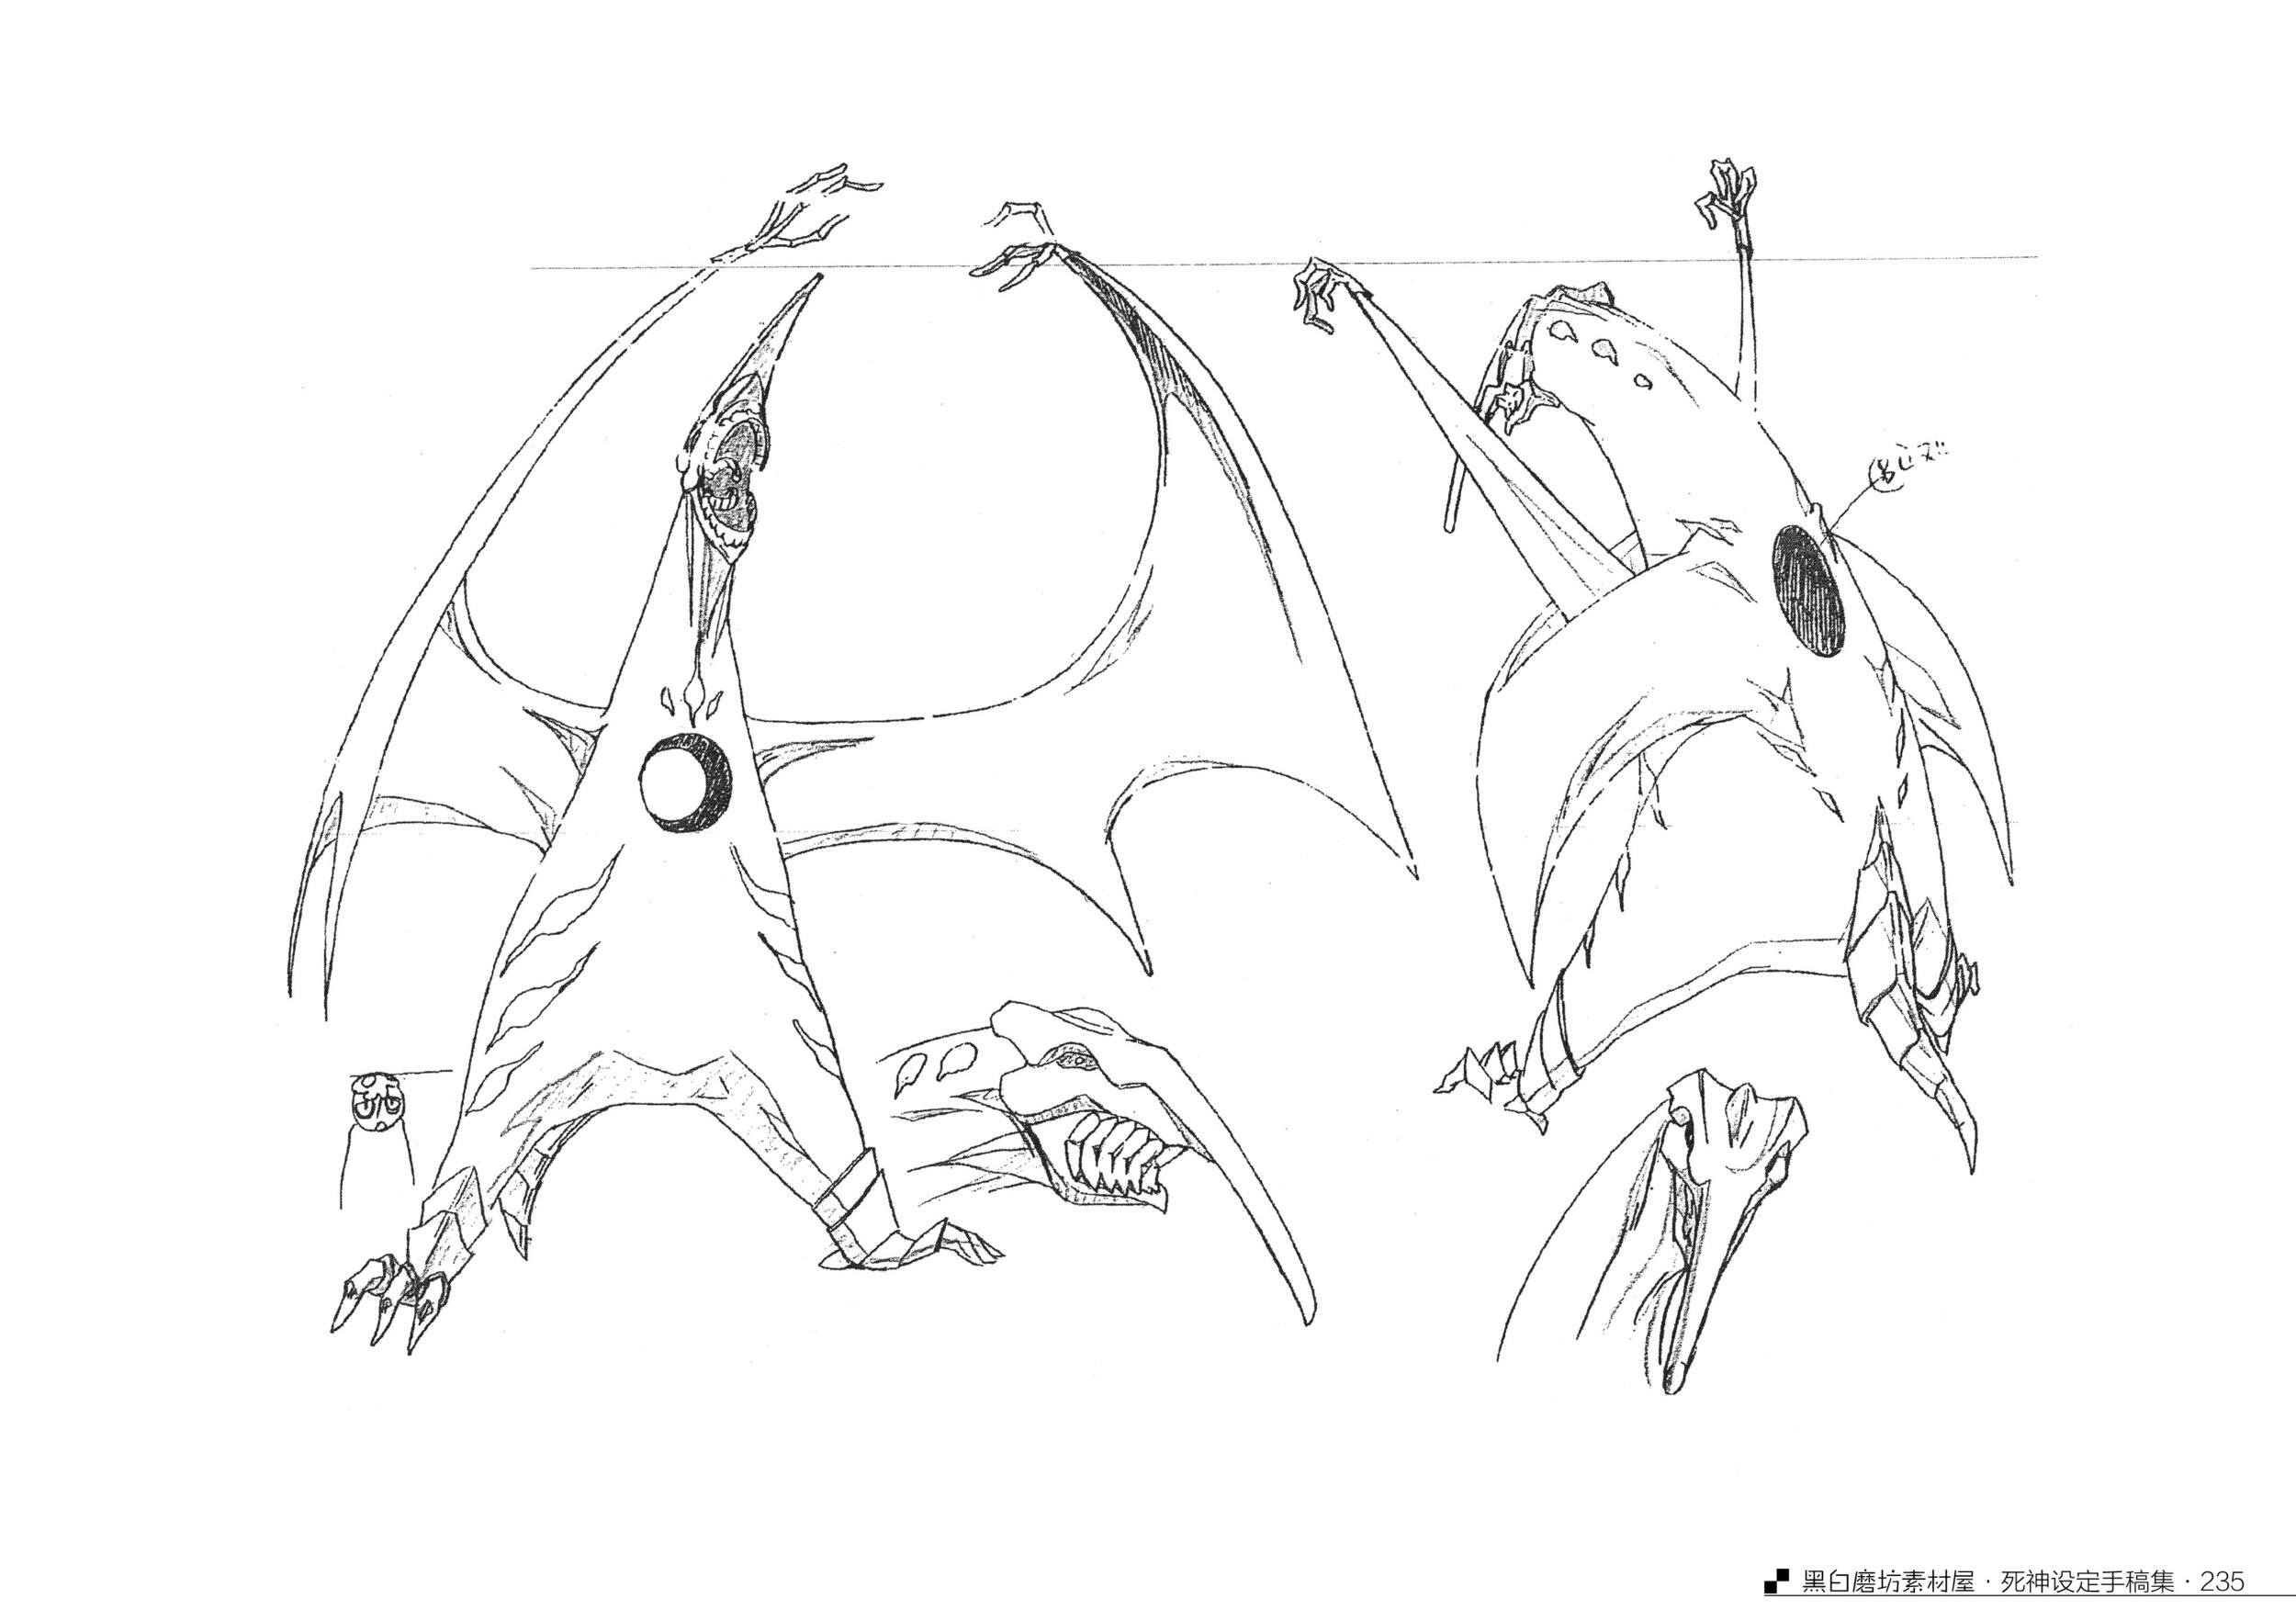 Art of the Bleach A - 213.jpg